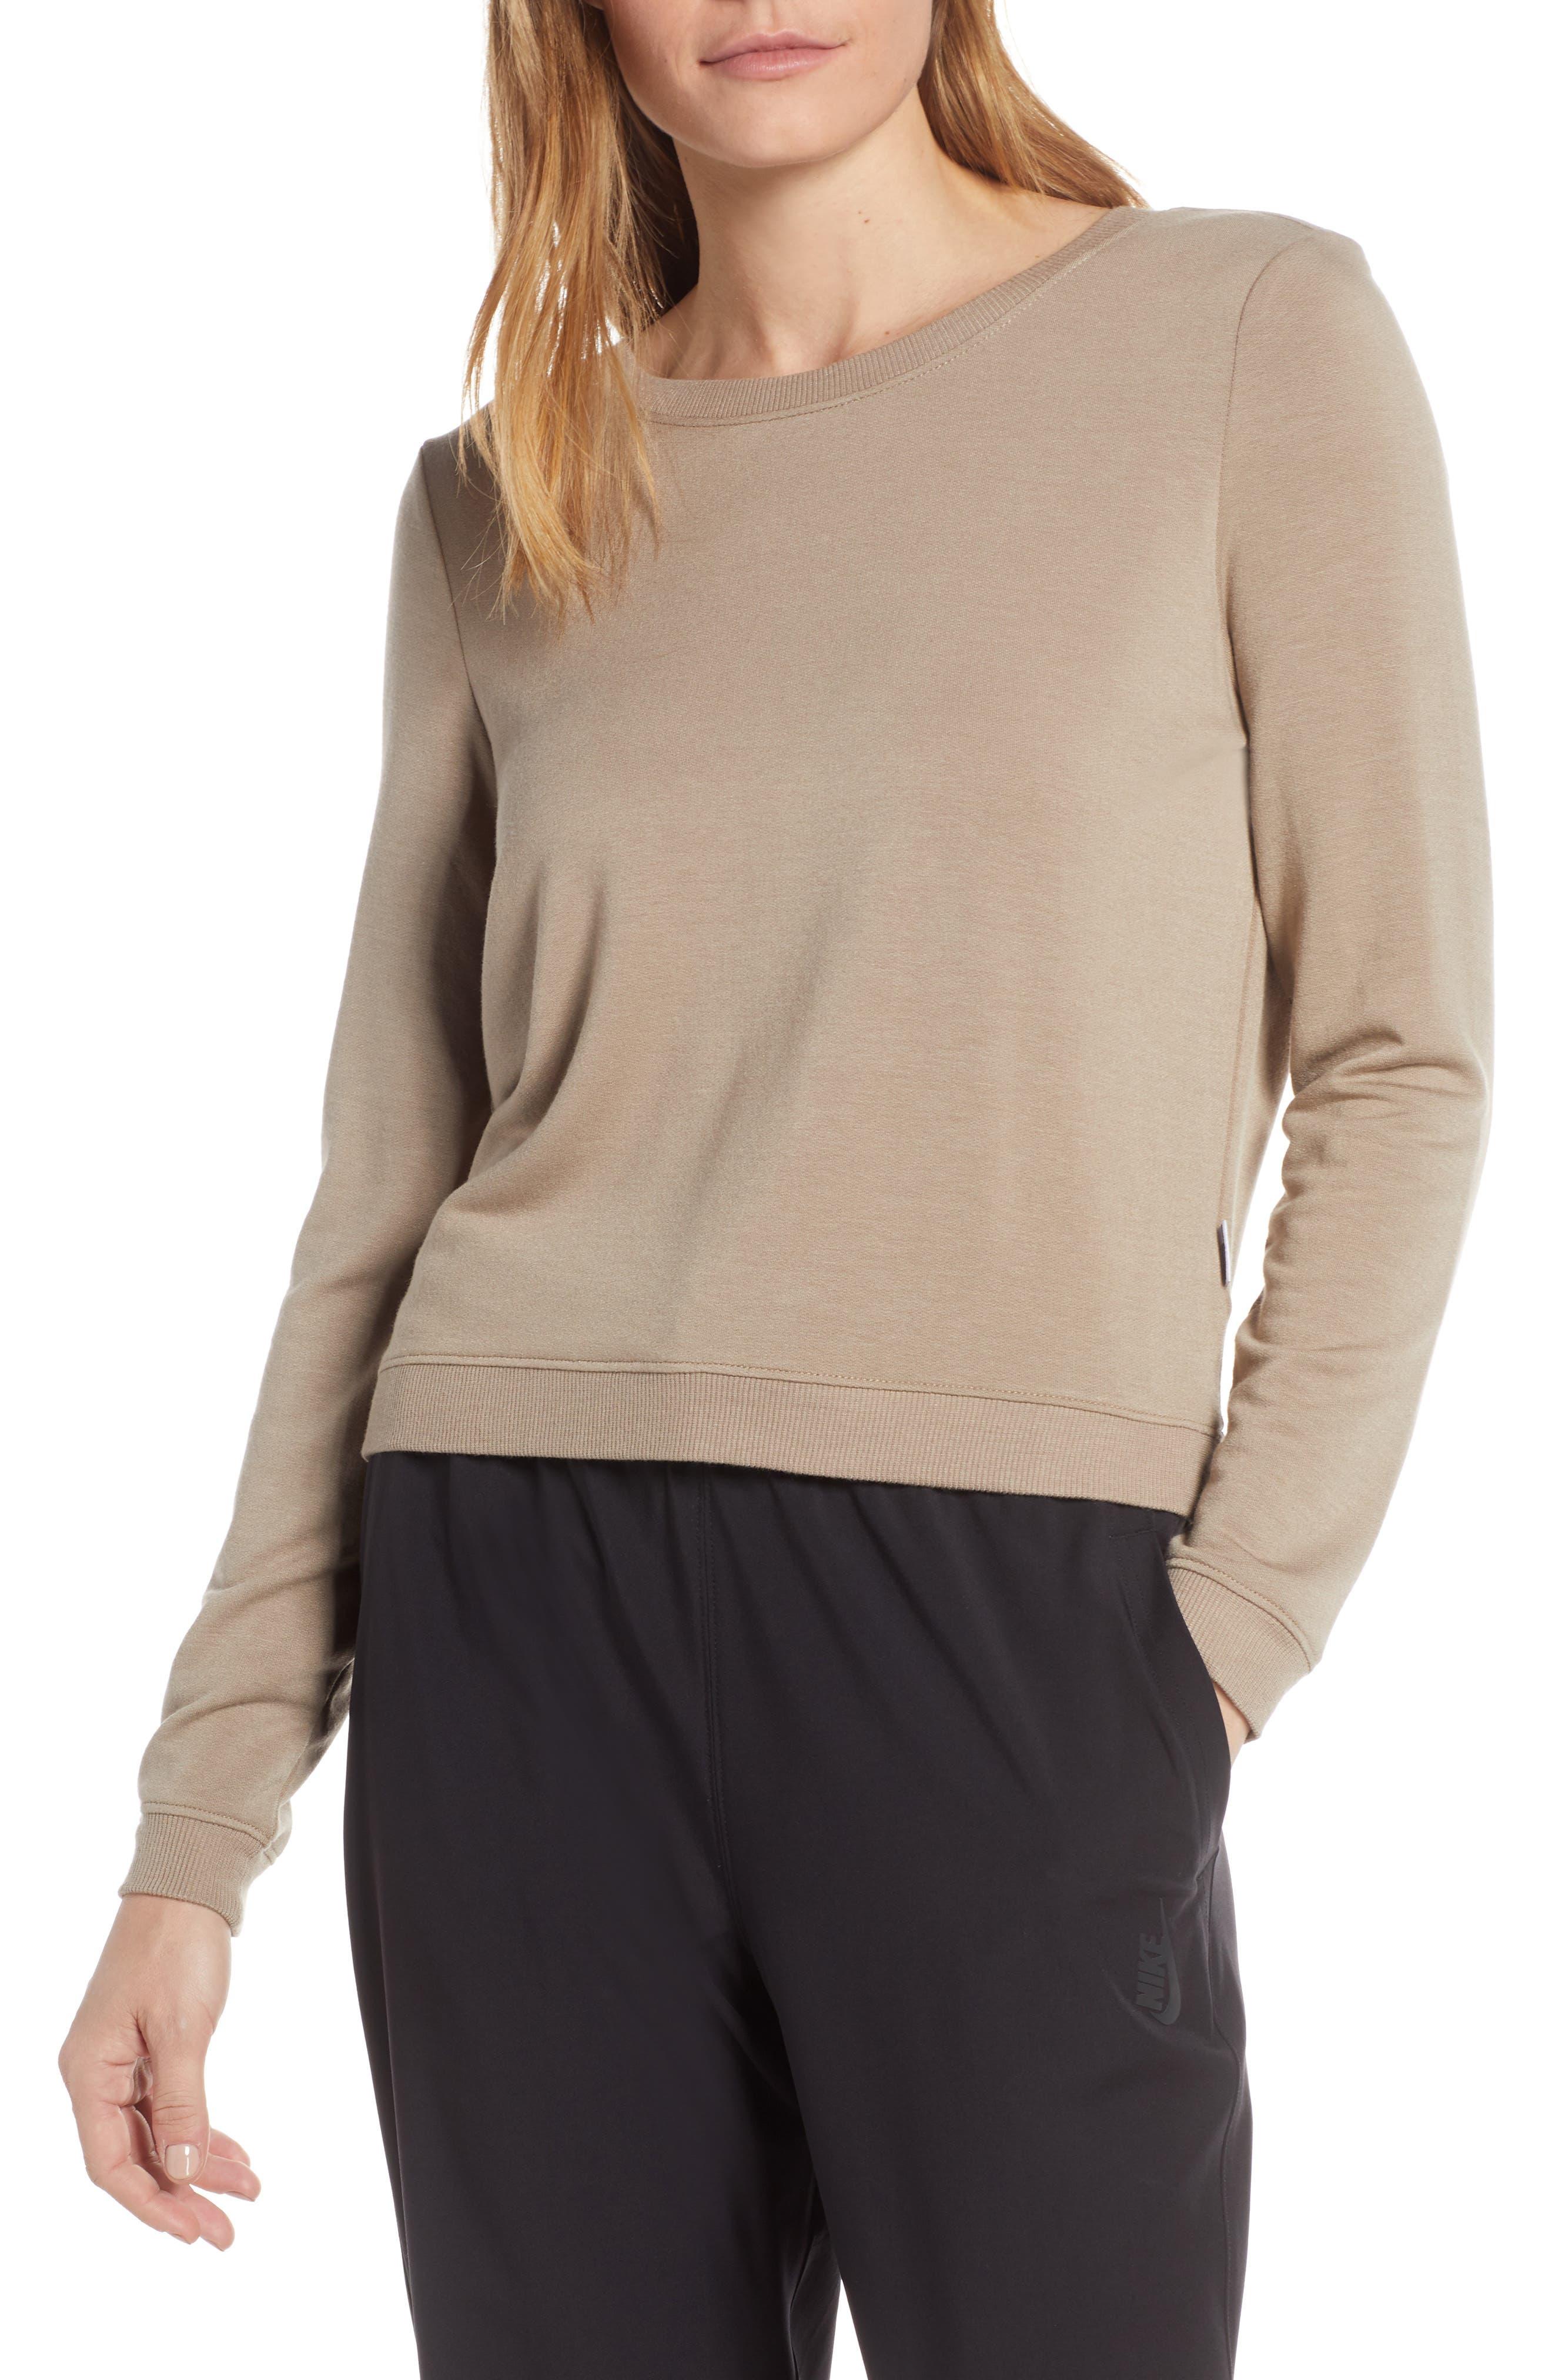 GOOD AMERICAN Plunge Back Sweatshirt, Main, color, LATTE001